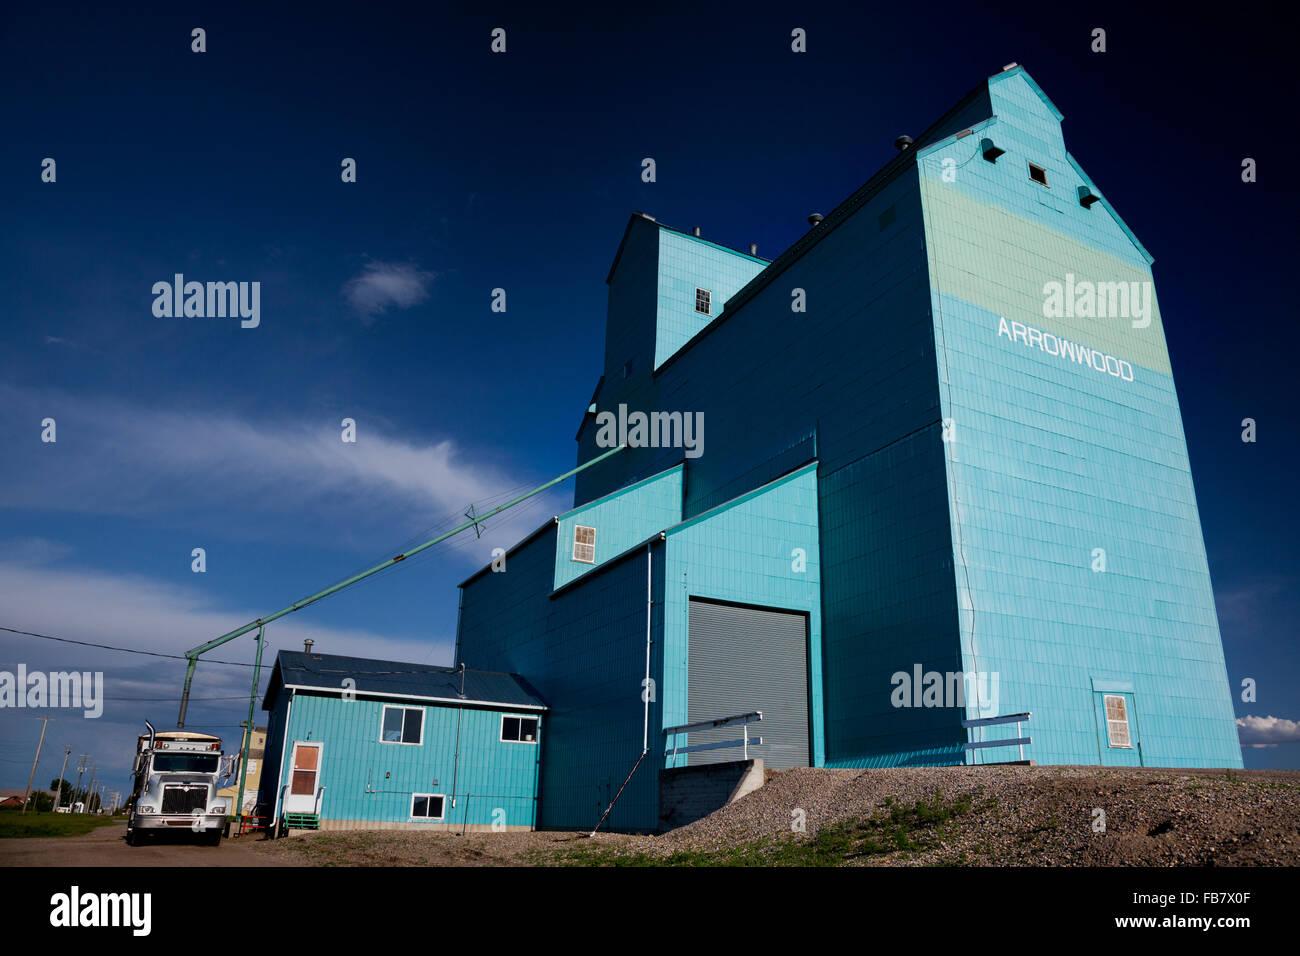 One of few remaining 'grain elevators' left on Alberta's Great Plains. Arrowwood, HIghway 547. - Stock Image